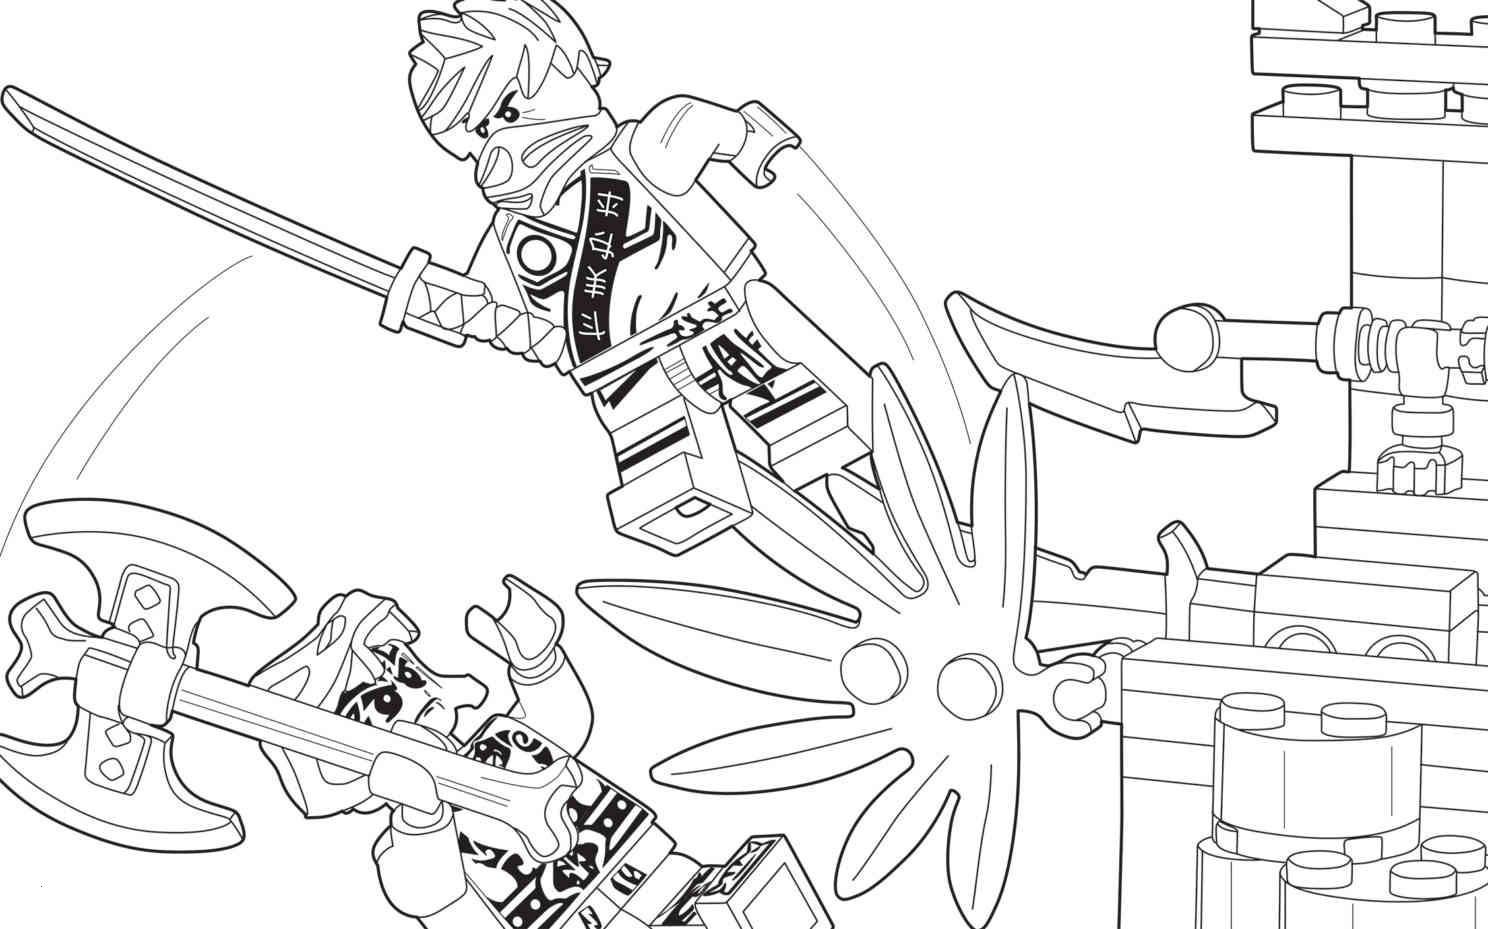 Lego Ninjago Ausmalbilder Das Beste Von Ninjago Malvorlagen Zum Ausdrucken Schön 37 Lego Ninjago Lloyd Stock